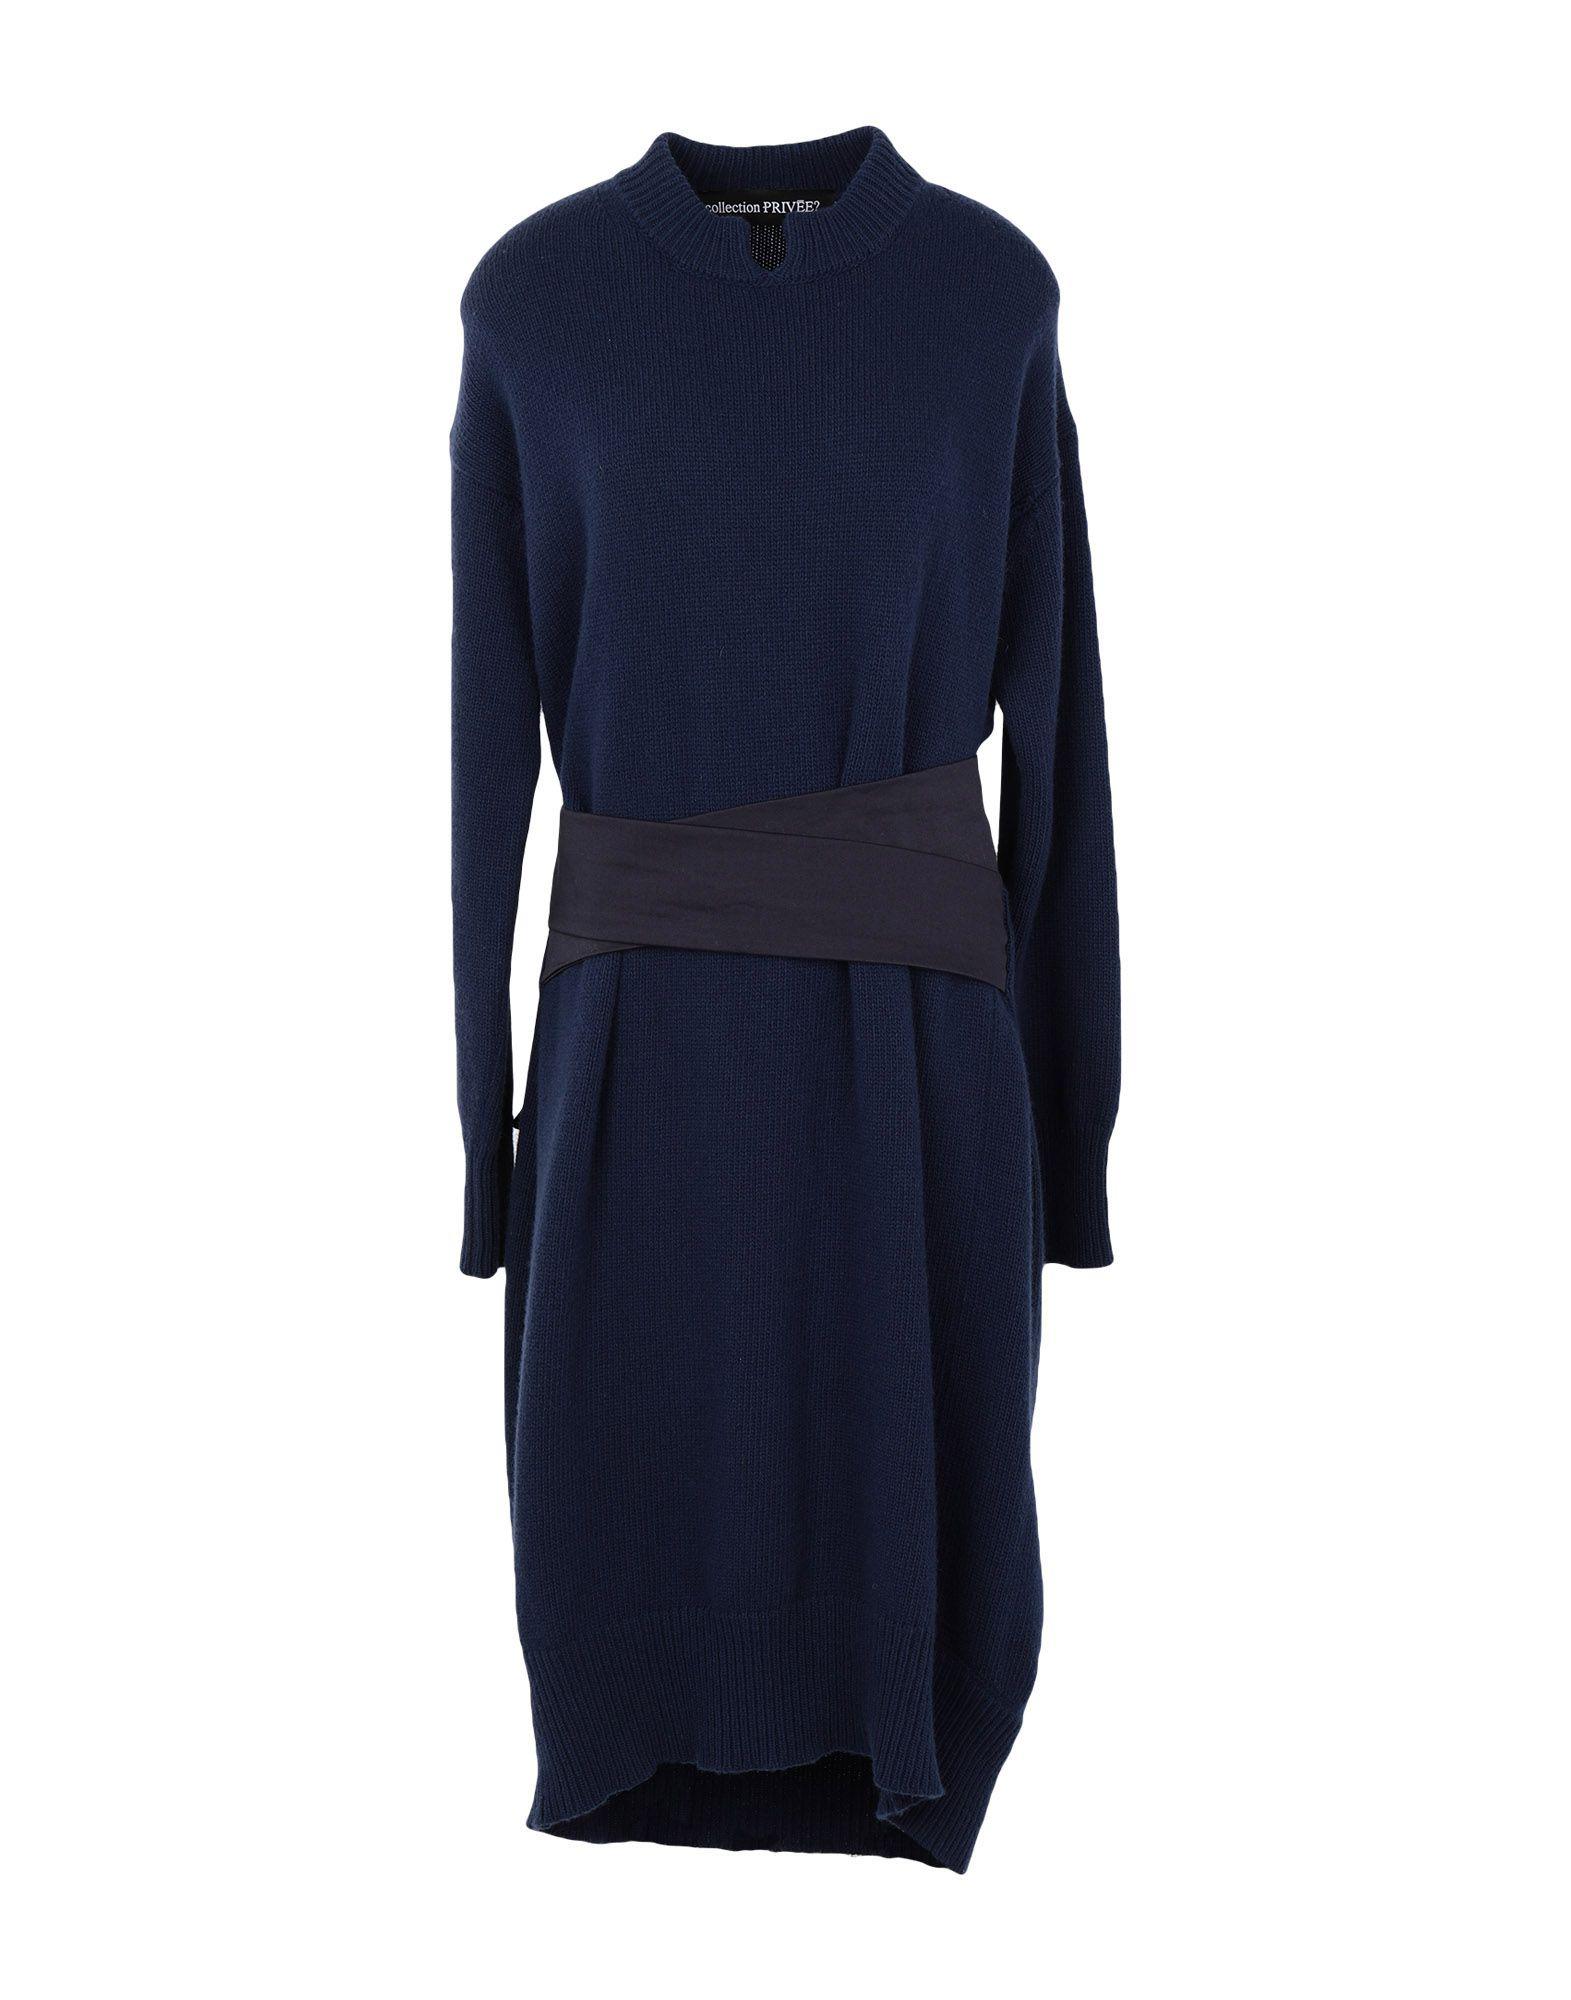 COLLECTION PRIVĒE? Платье до колена collection privēe вьетнамки